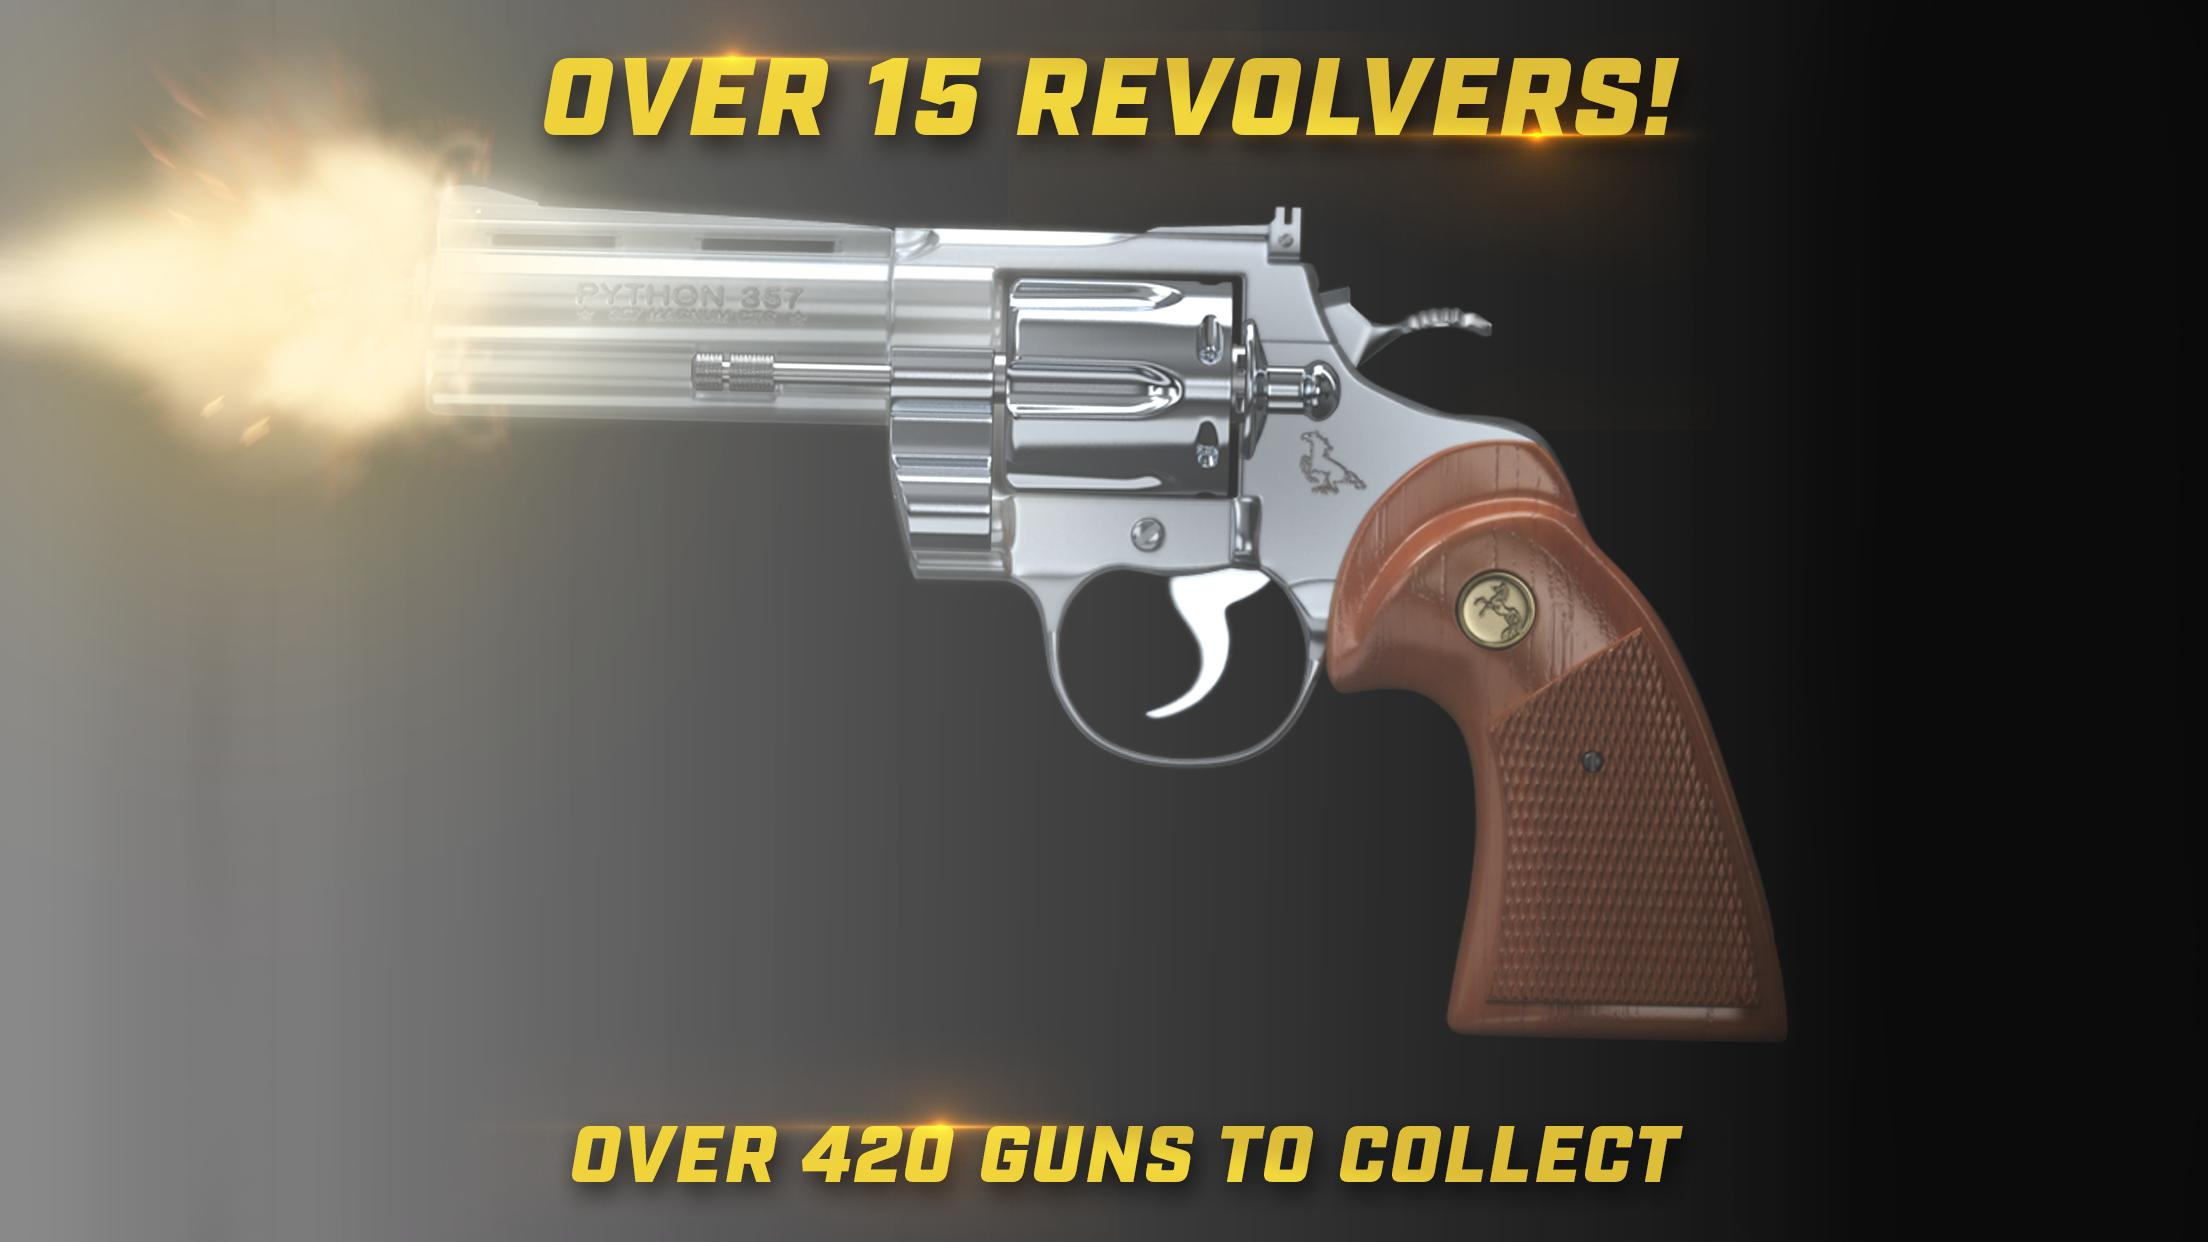 iGun Pro The Original Gun App 5.26 Screenshot 1